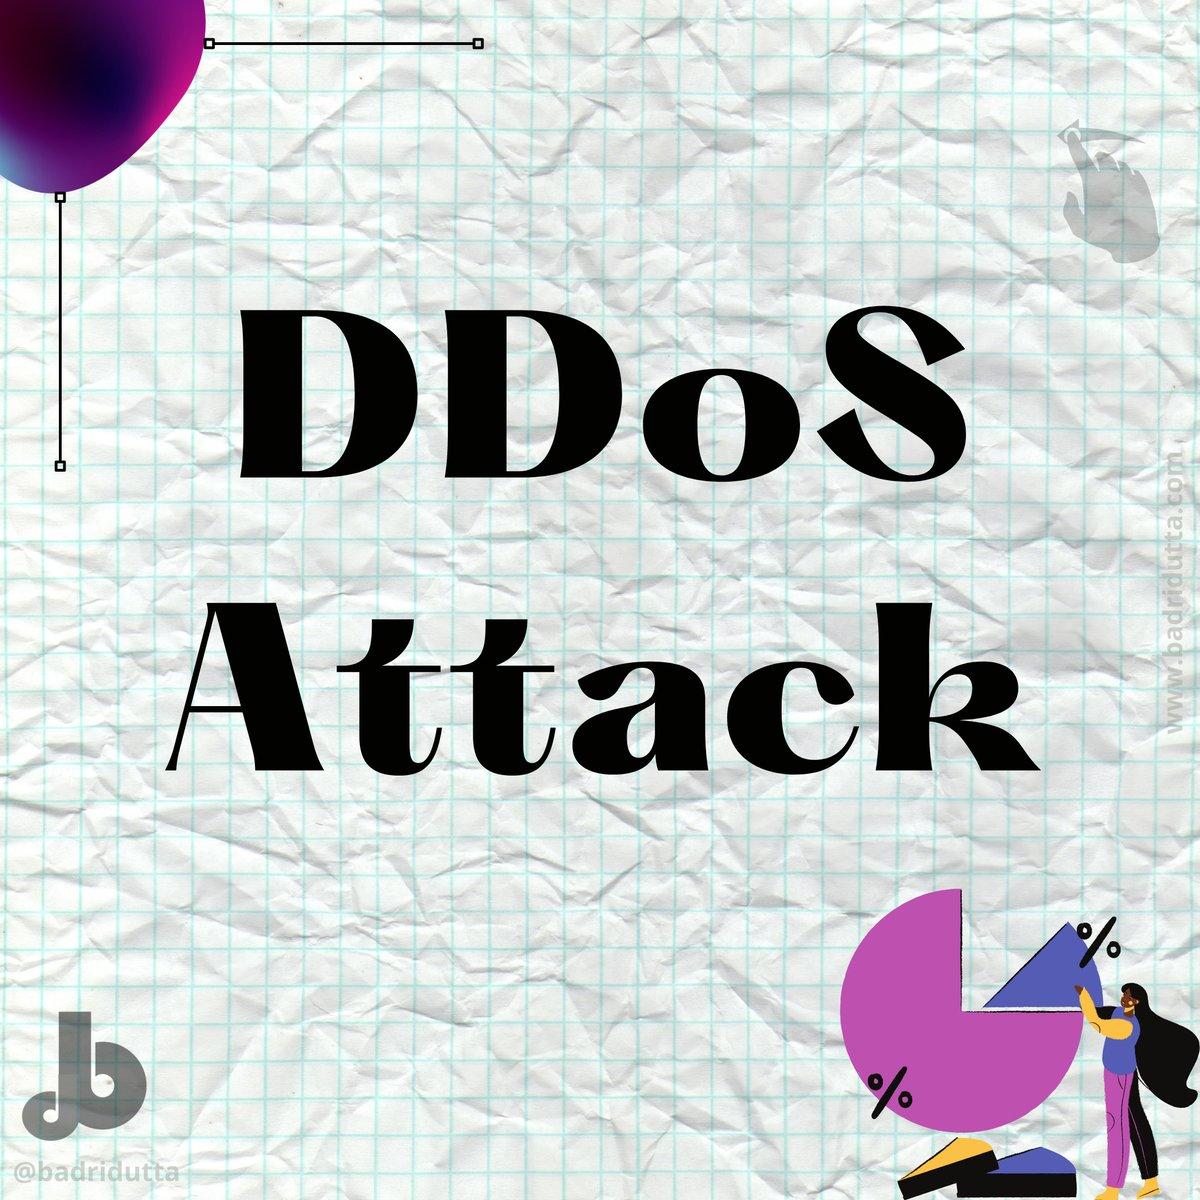 What is a DDoS Attack? #webdesign #design #graphicdesign #websitelaunch #ddos #webdevelopment #webdesigner #branding #firewall #ddosattack #websitedesign #badridutta #webdeveloper #ui #ux #websitesecurity #socialmedia #uidesign #digitalpotli  #dnsrecord #cloudsecurity #uxdesign